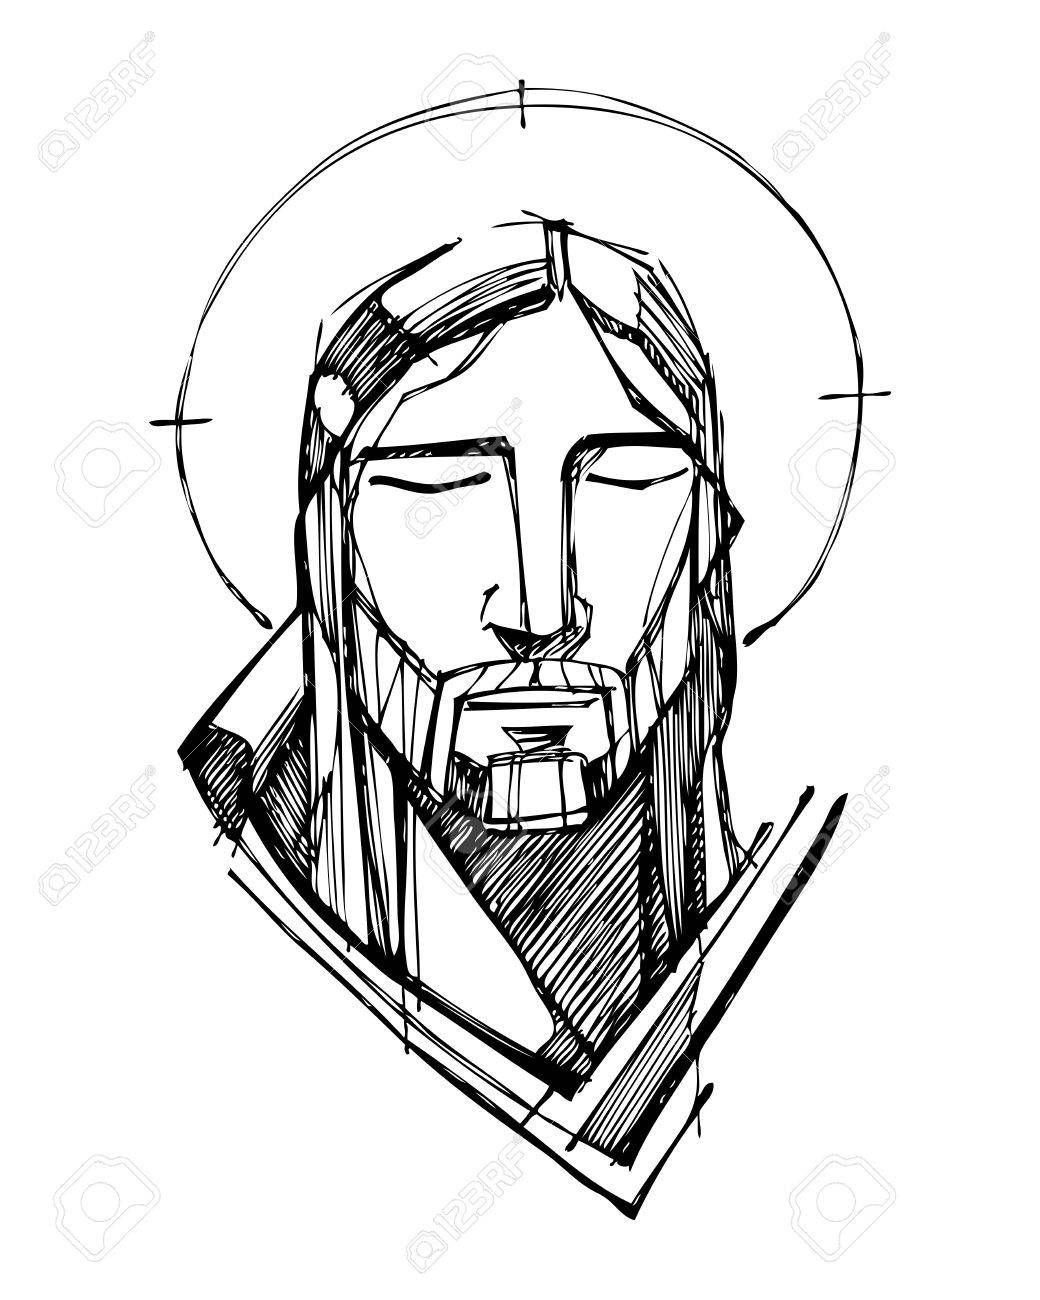 1040x1300 stock photo in jesus sketches jesus christ drawing, jesus